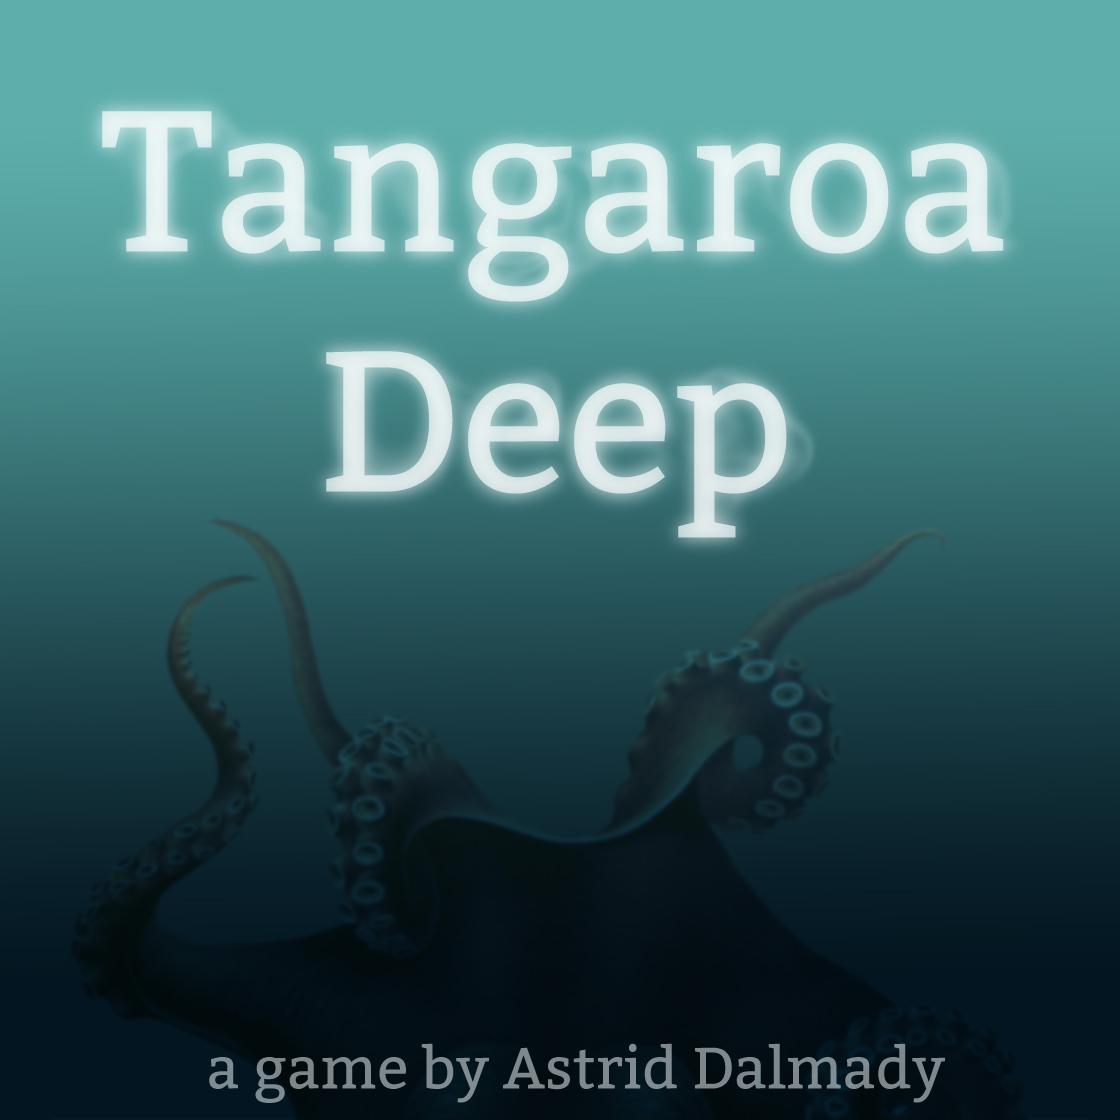 Tangaroa Deep (Astrid Dalmady)